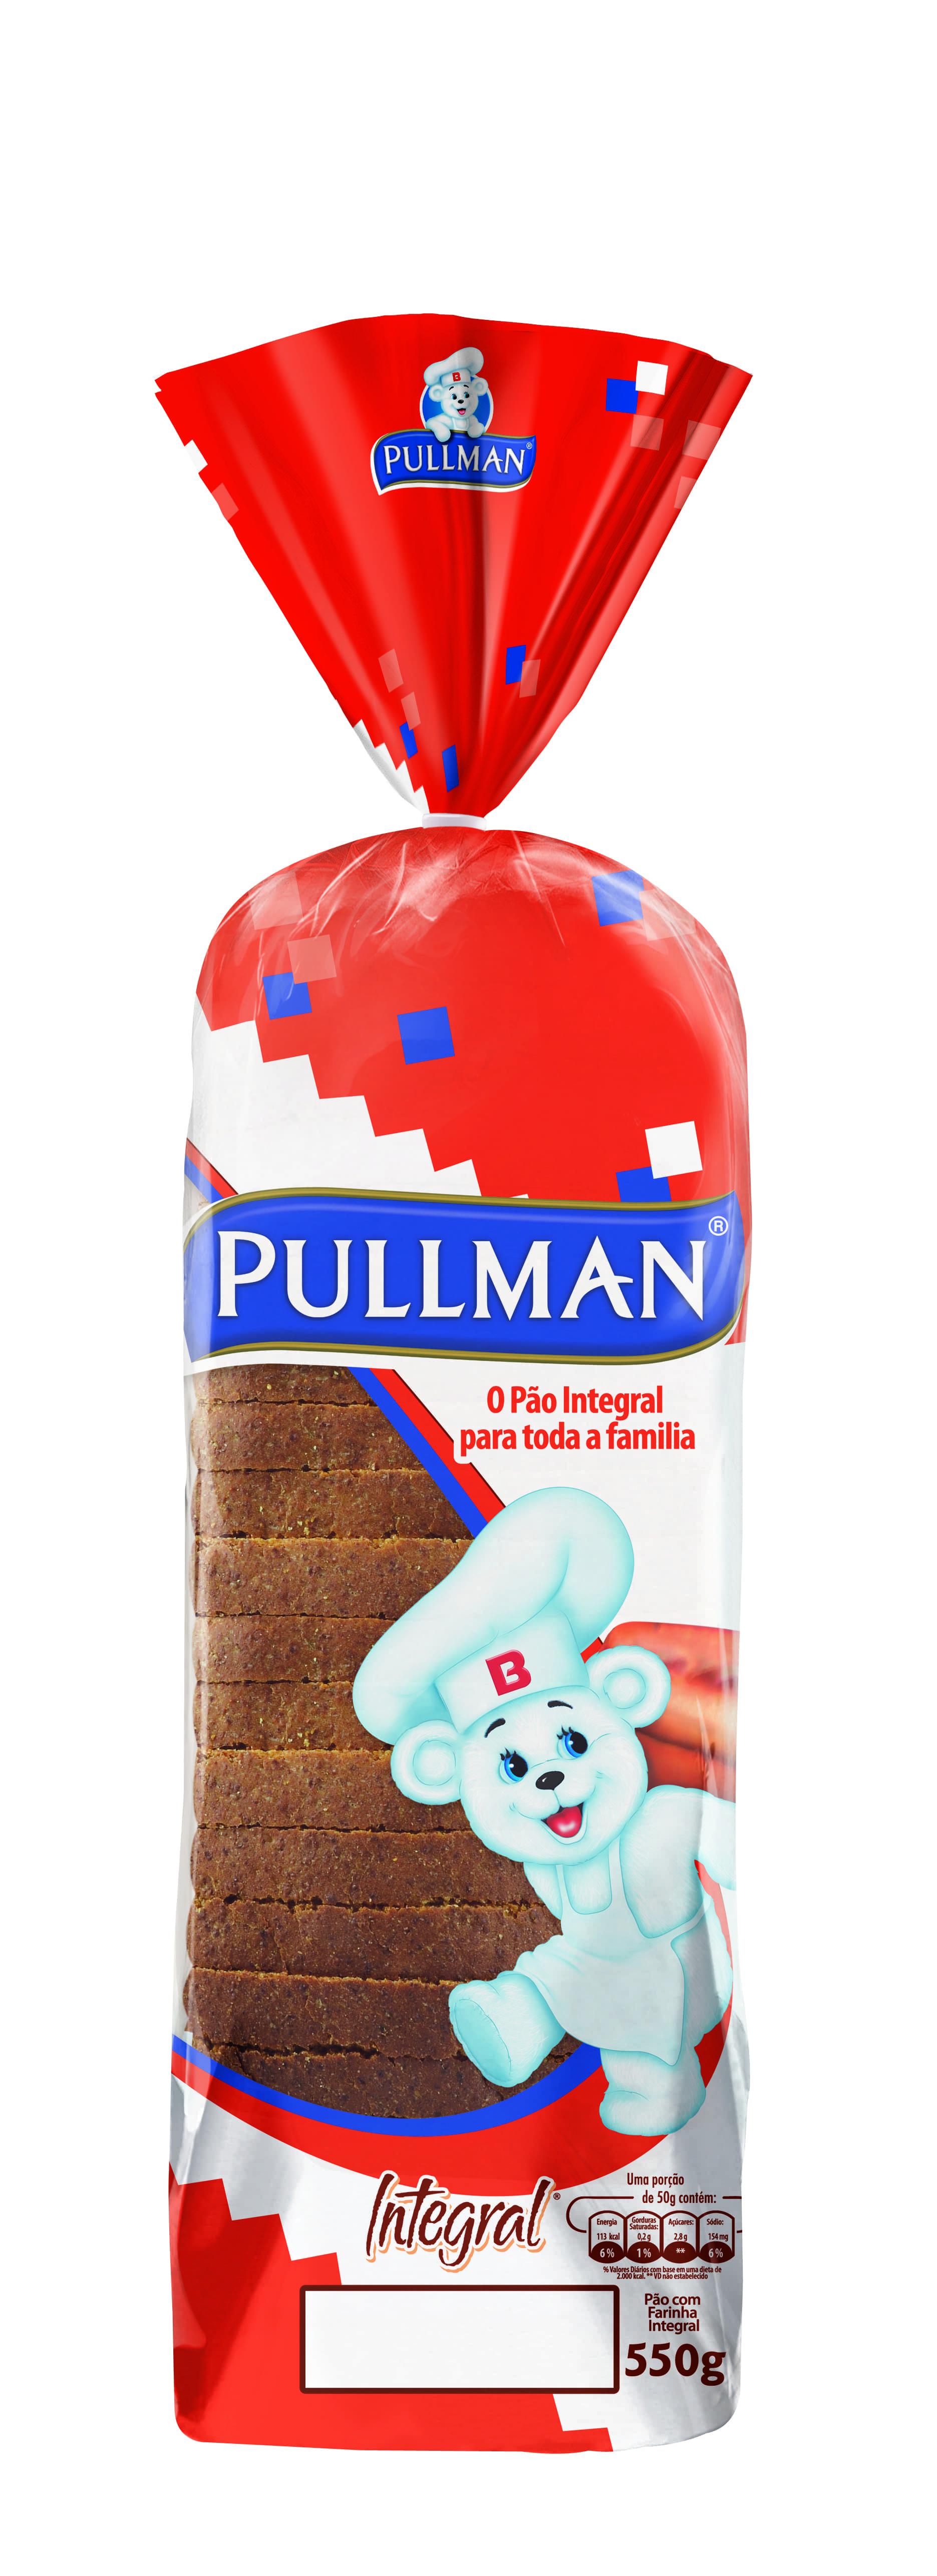 Pullman-Integral